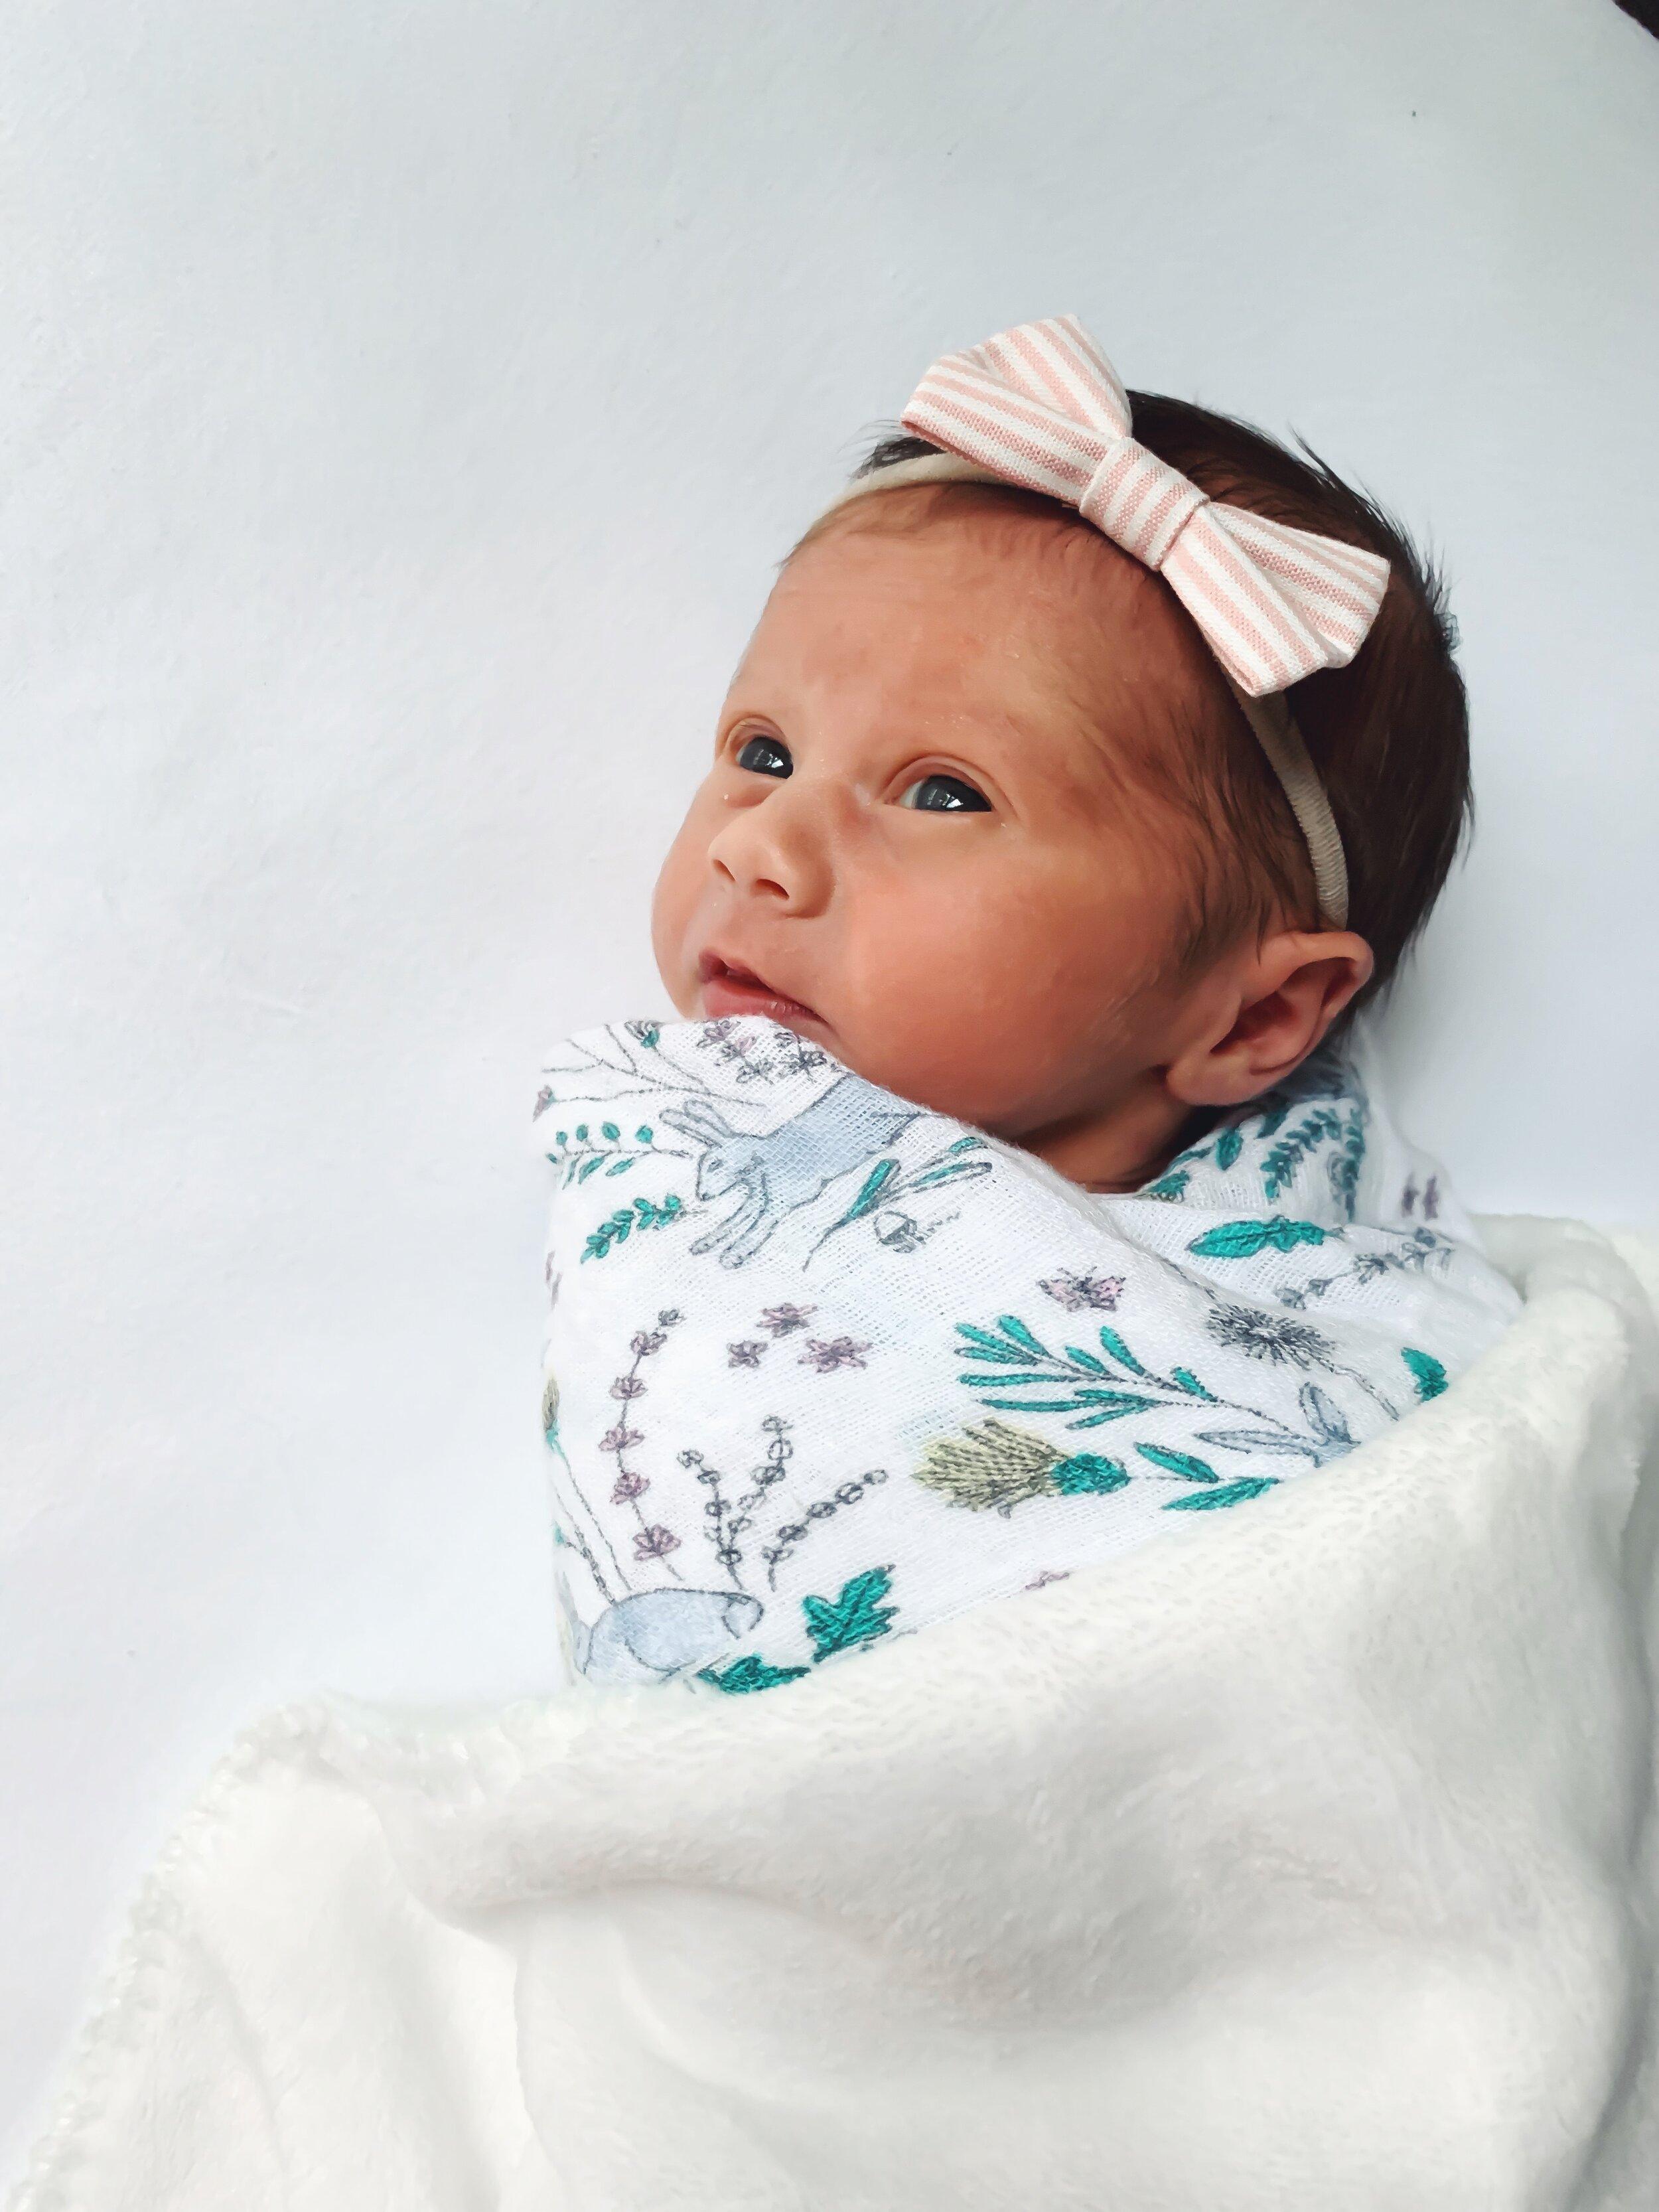 birth story, birth announcement